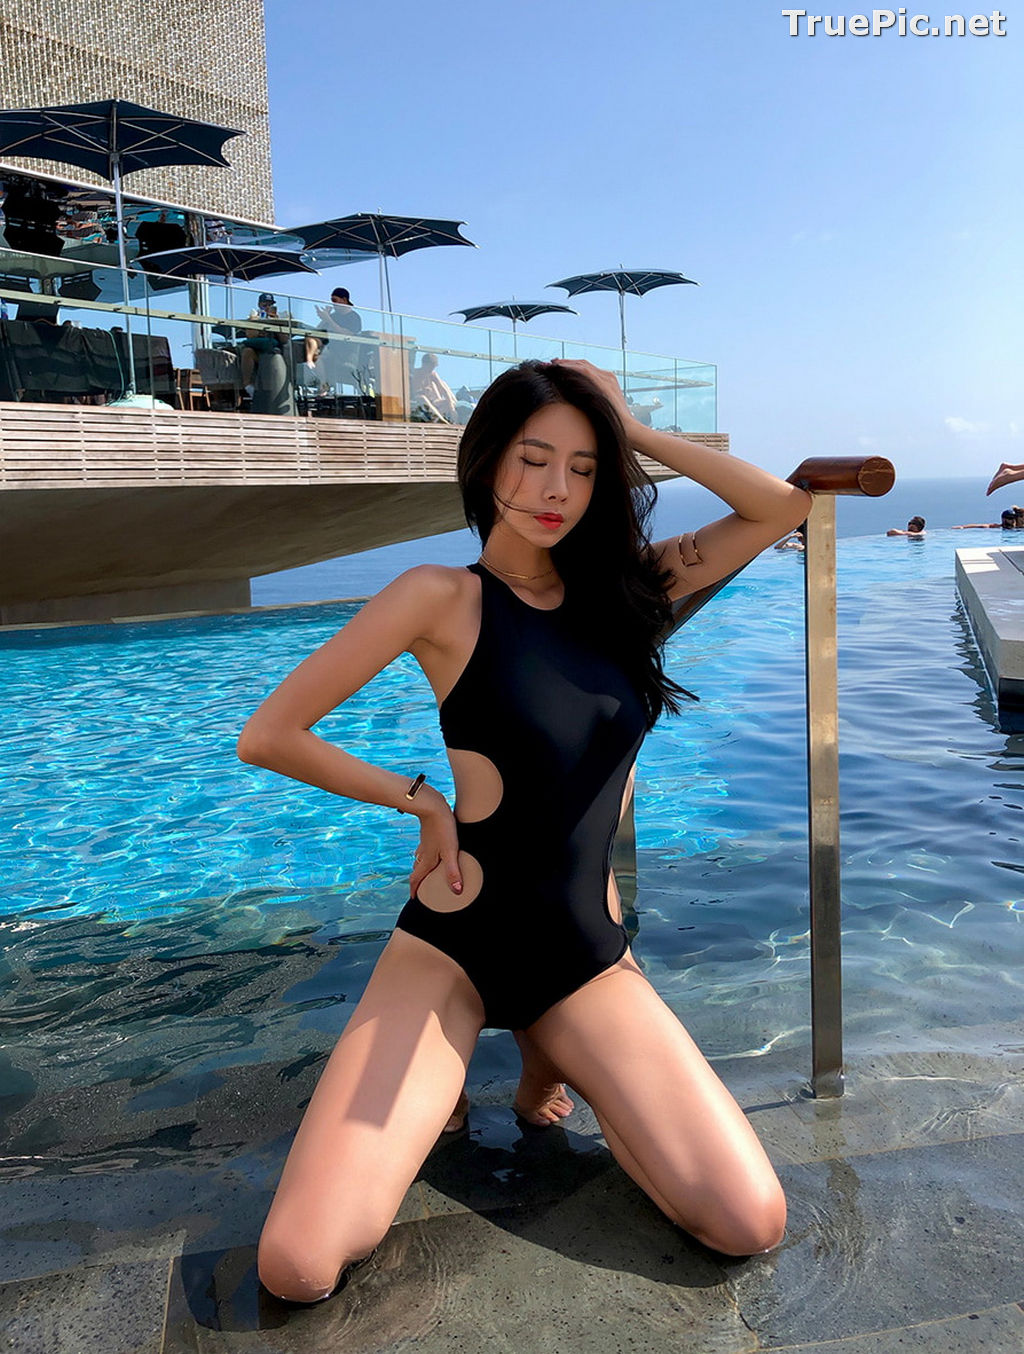 Image Kwon Byul - Korean Fashion Model - Black Monokini - TruePic.net - Picture-9